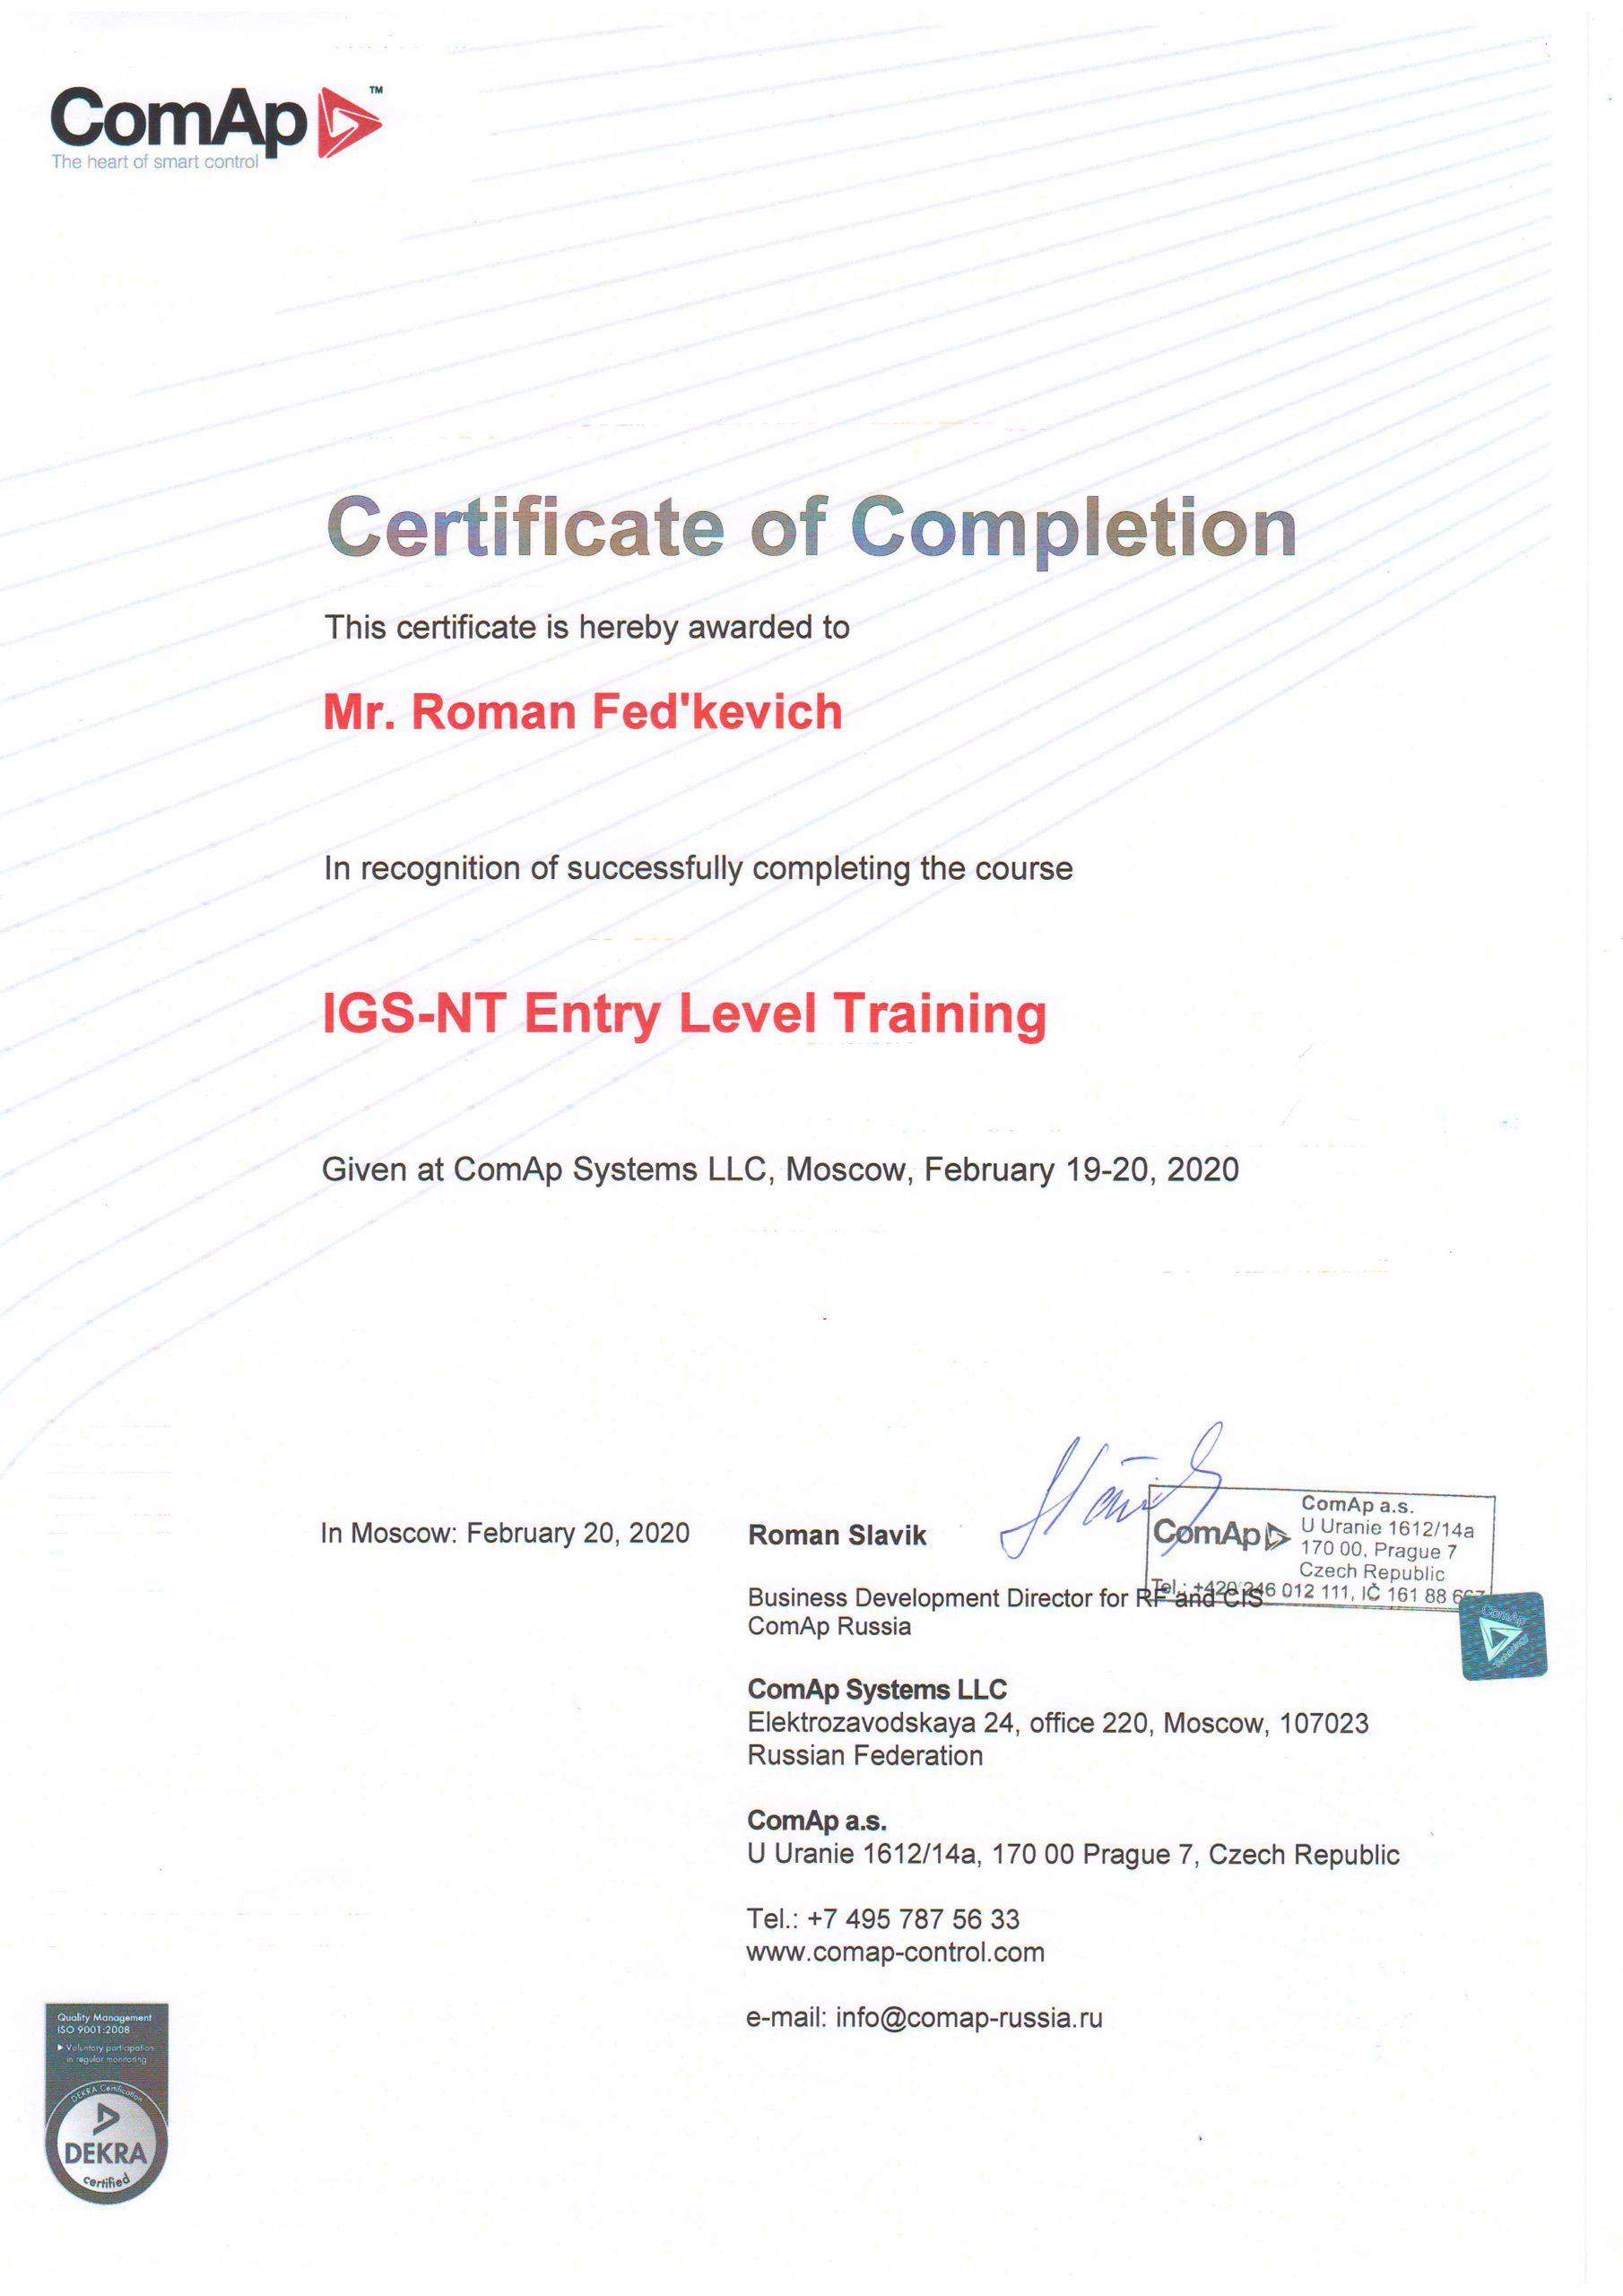 Сертификат ComAp - Федькевич Роман